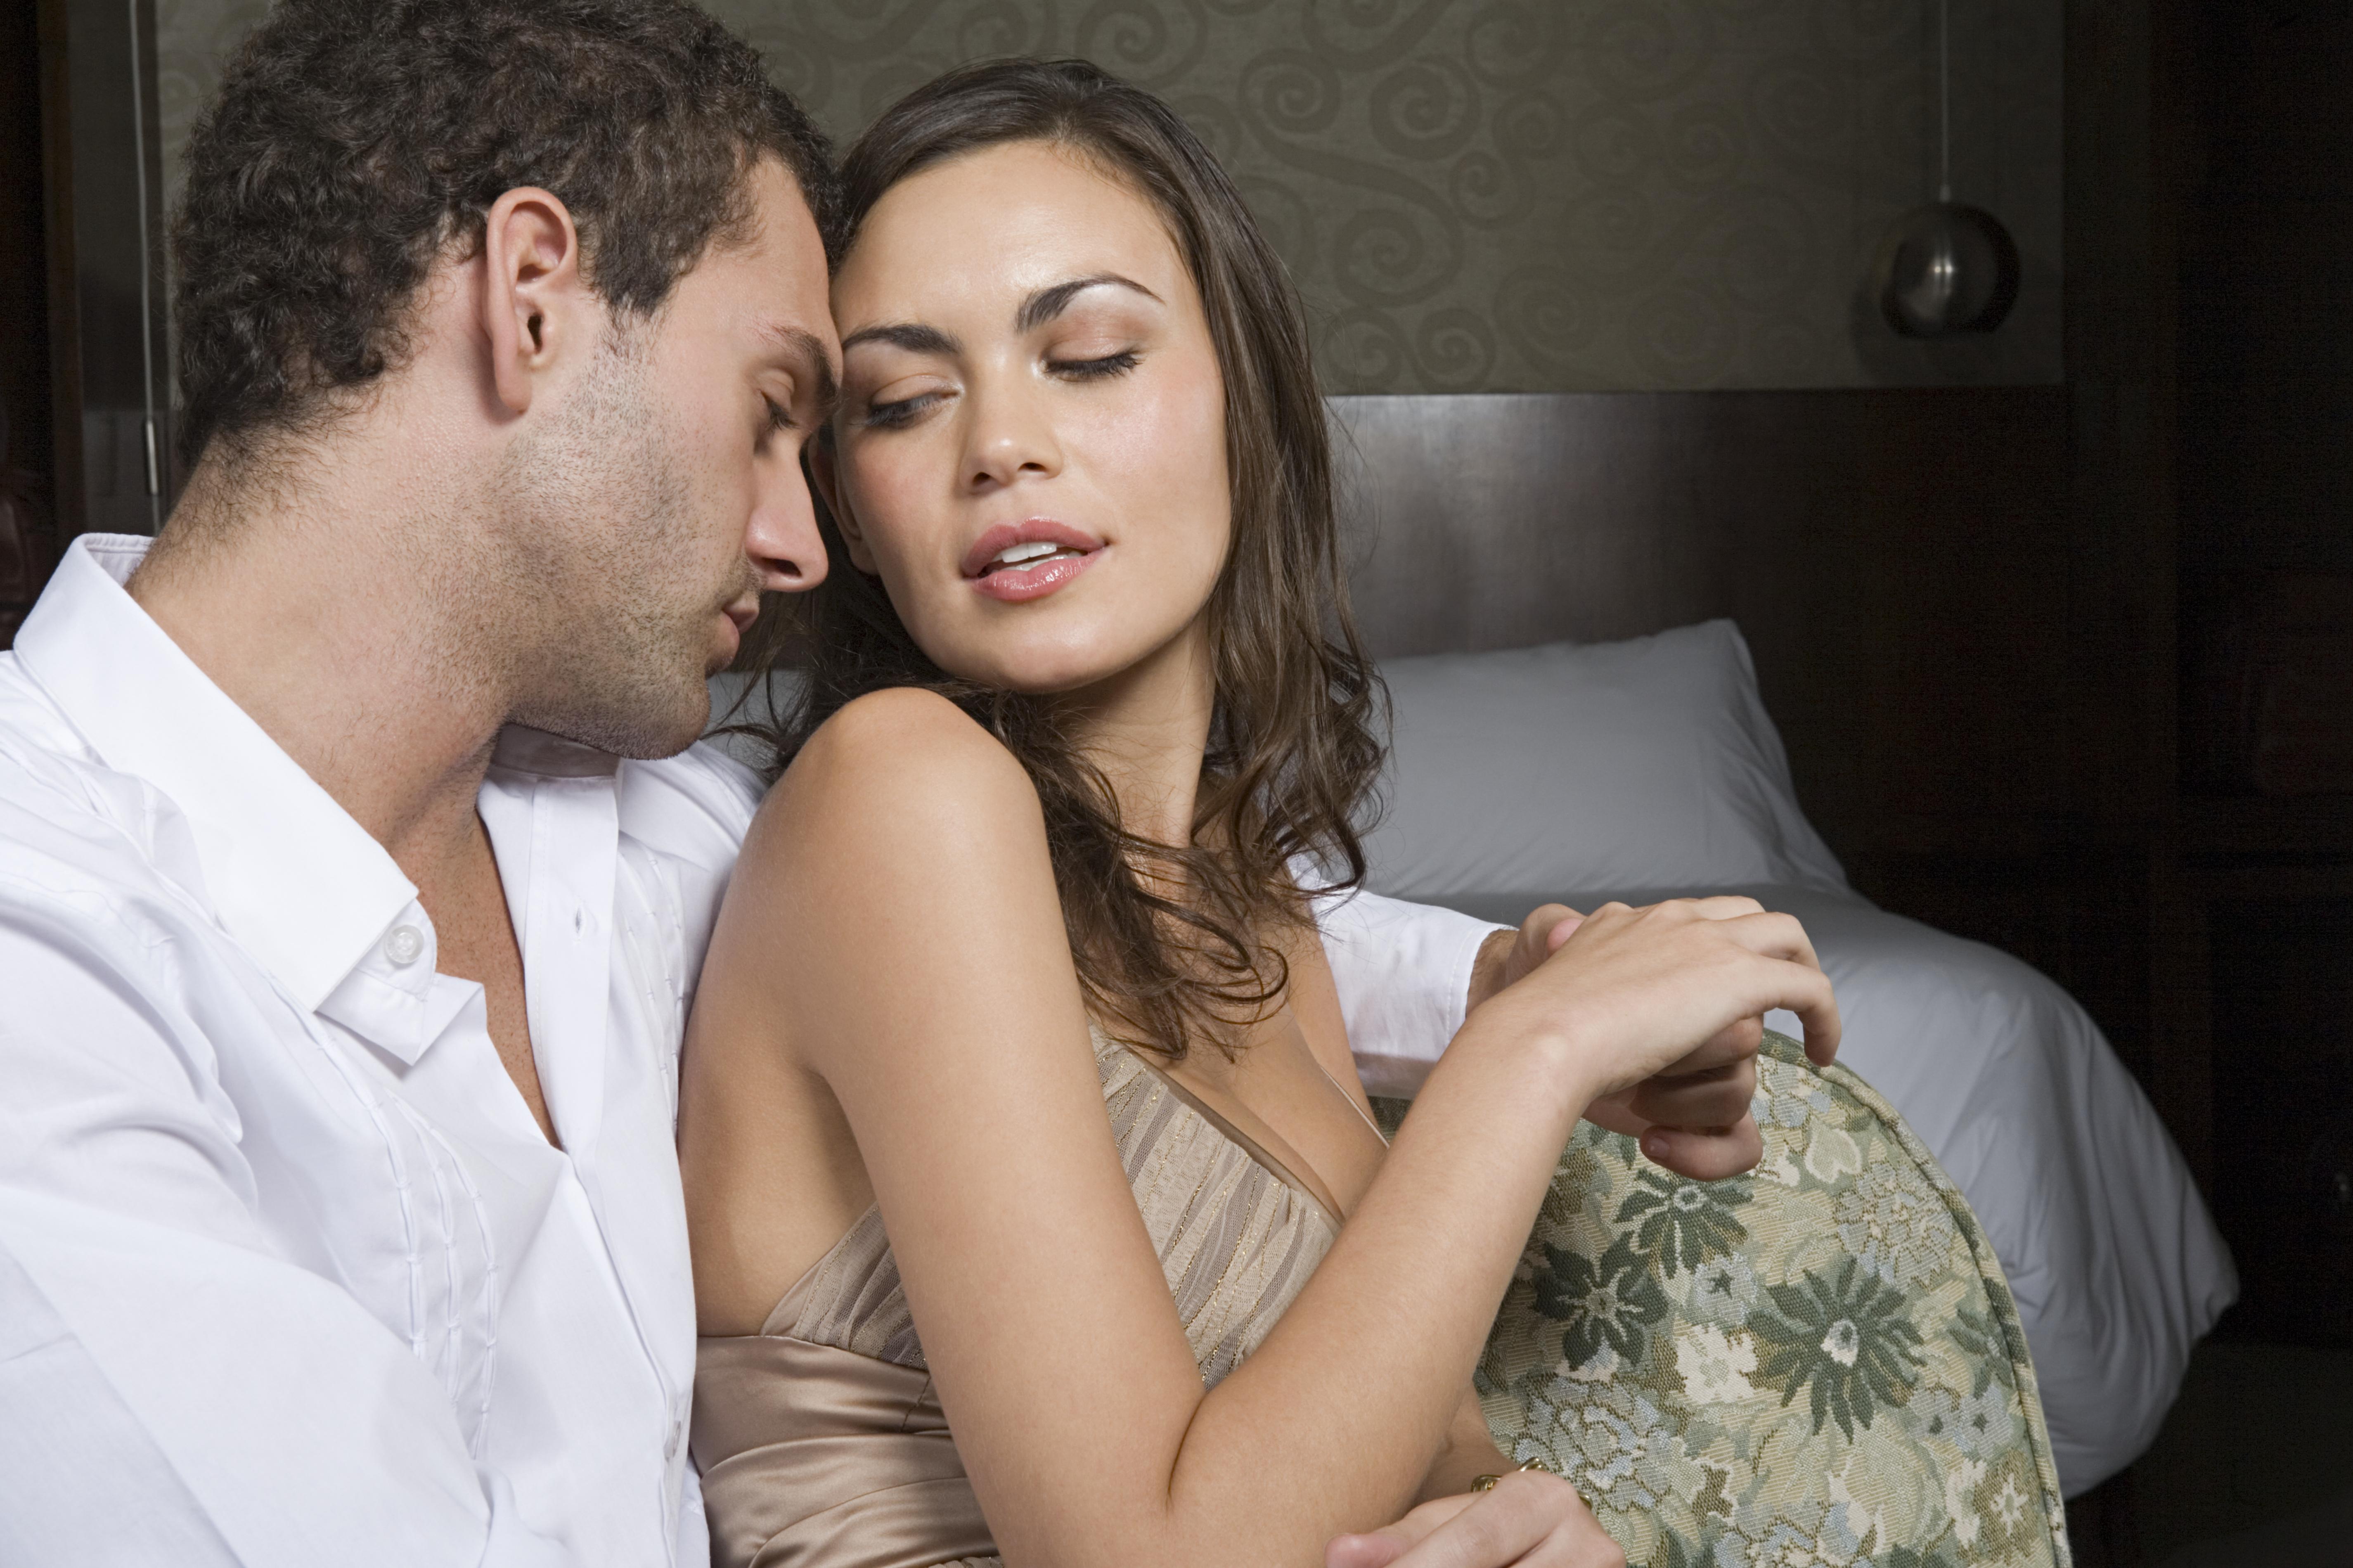 Видео секс женщина изменяет супругу 3